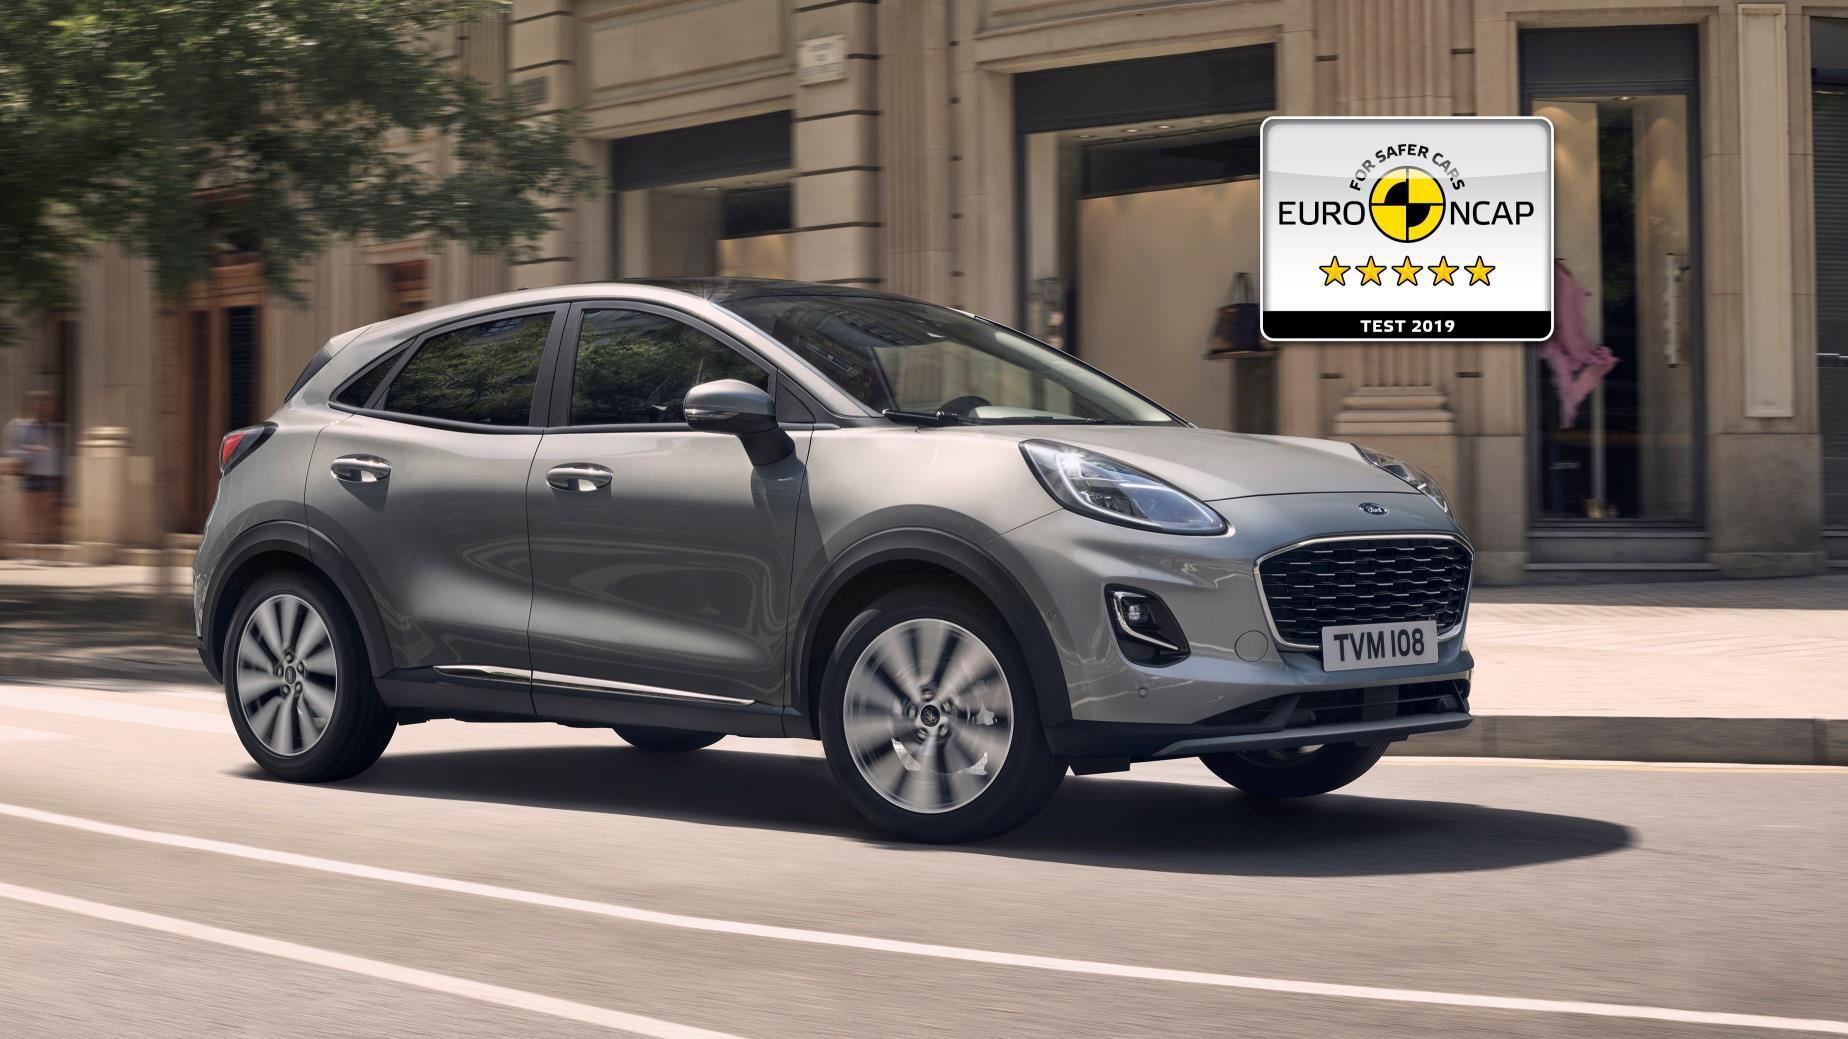 VÍDEO: Ford Puma, cinco estrellas Euro NCAP